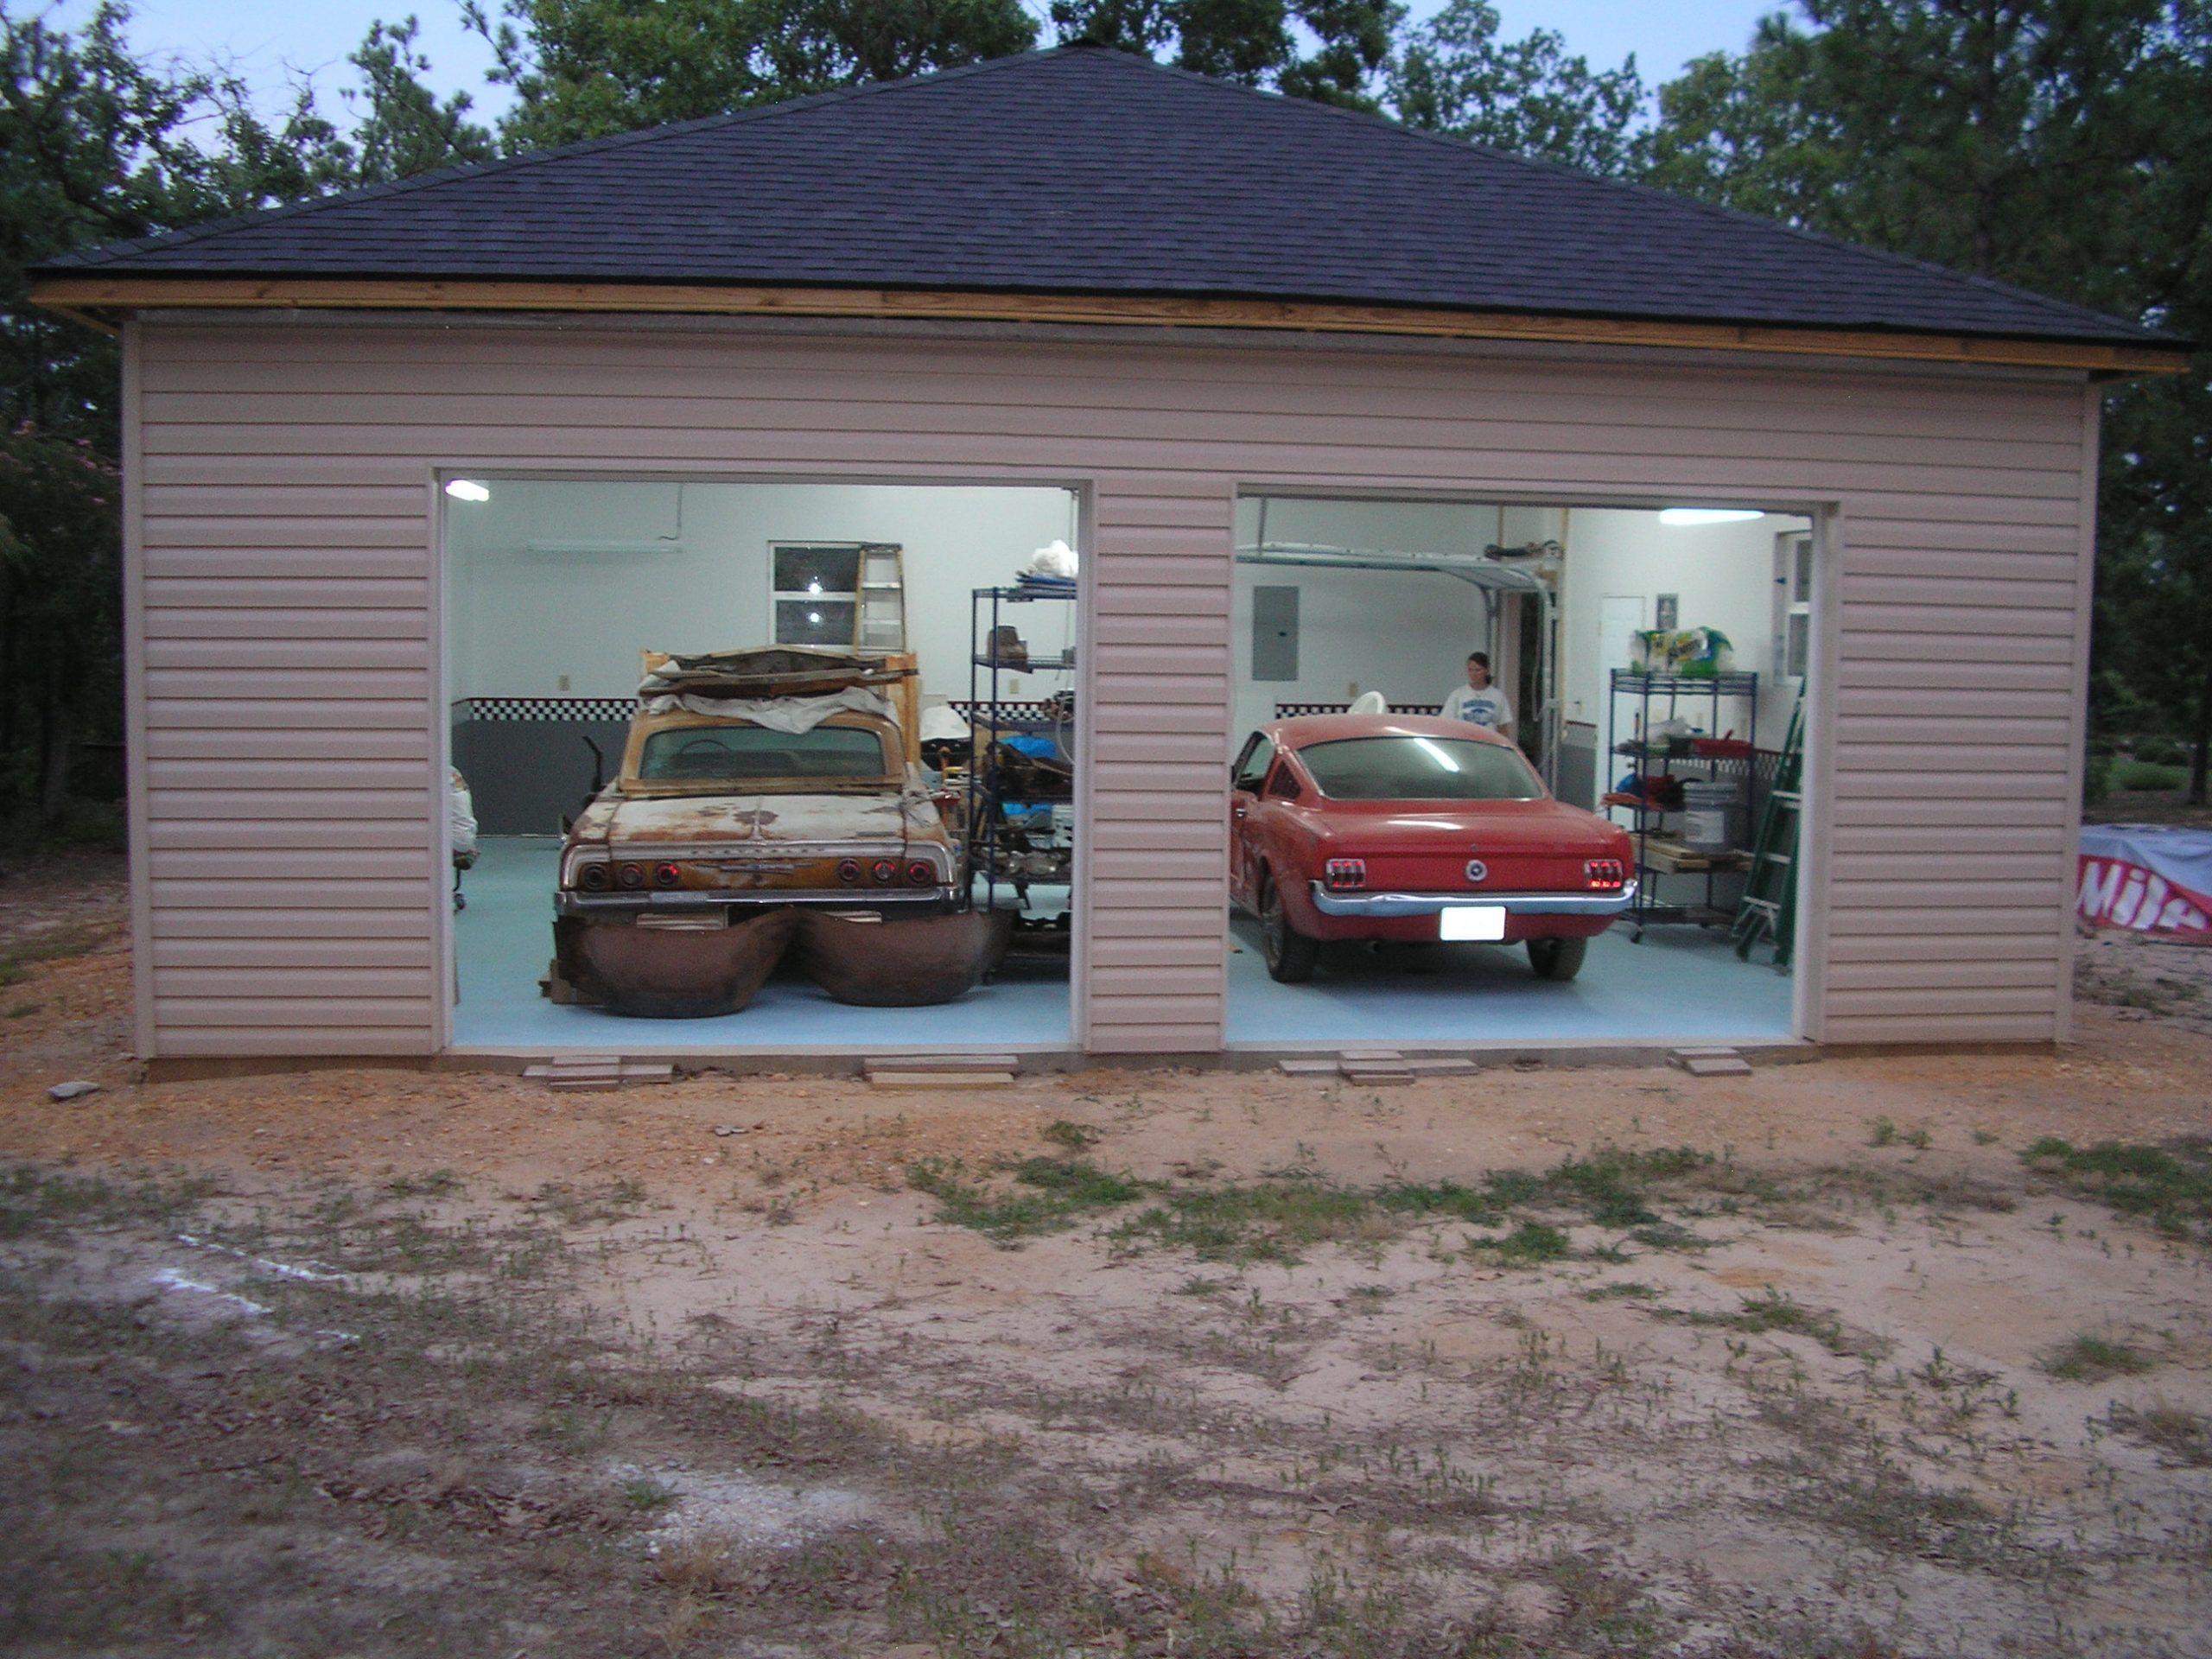 47 Cheap Laminate Flooring Packs Pics